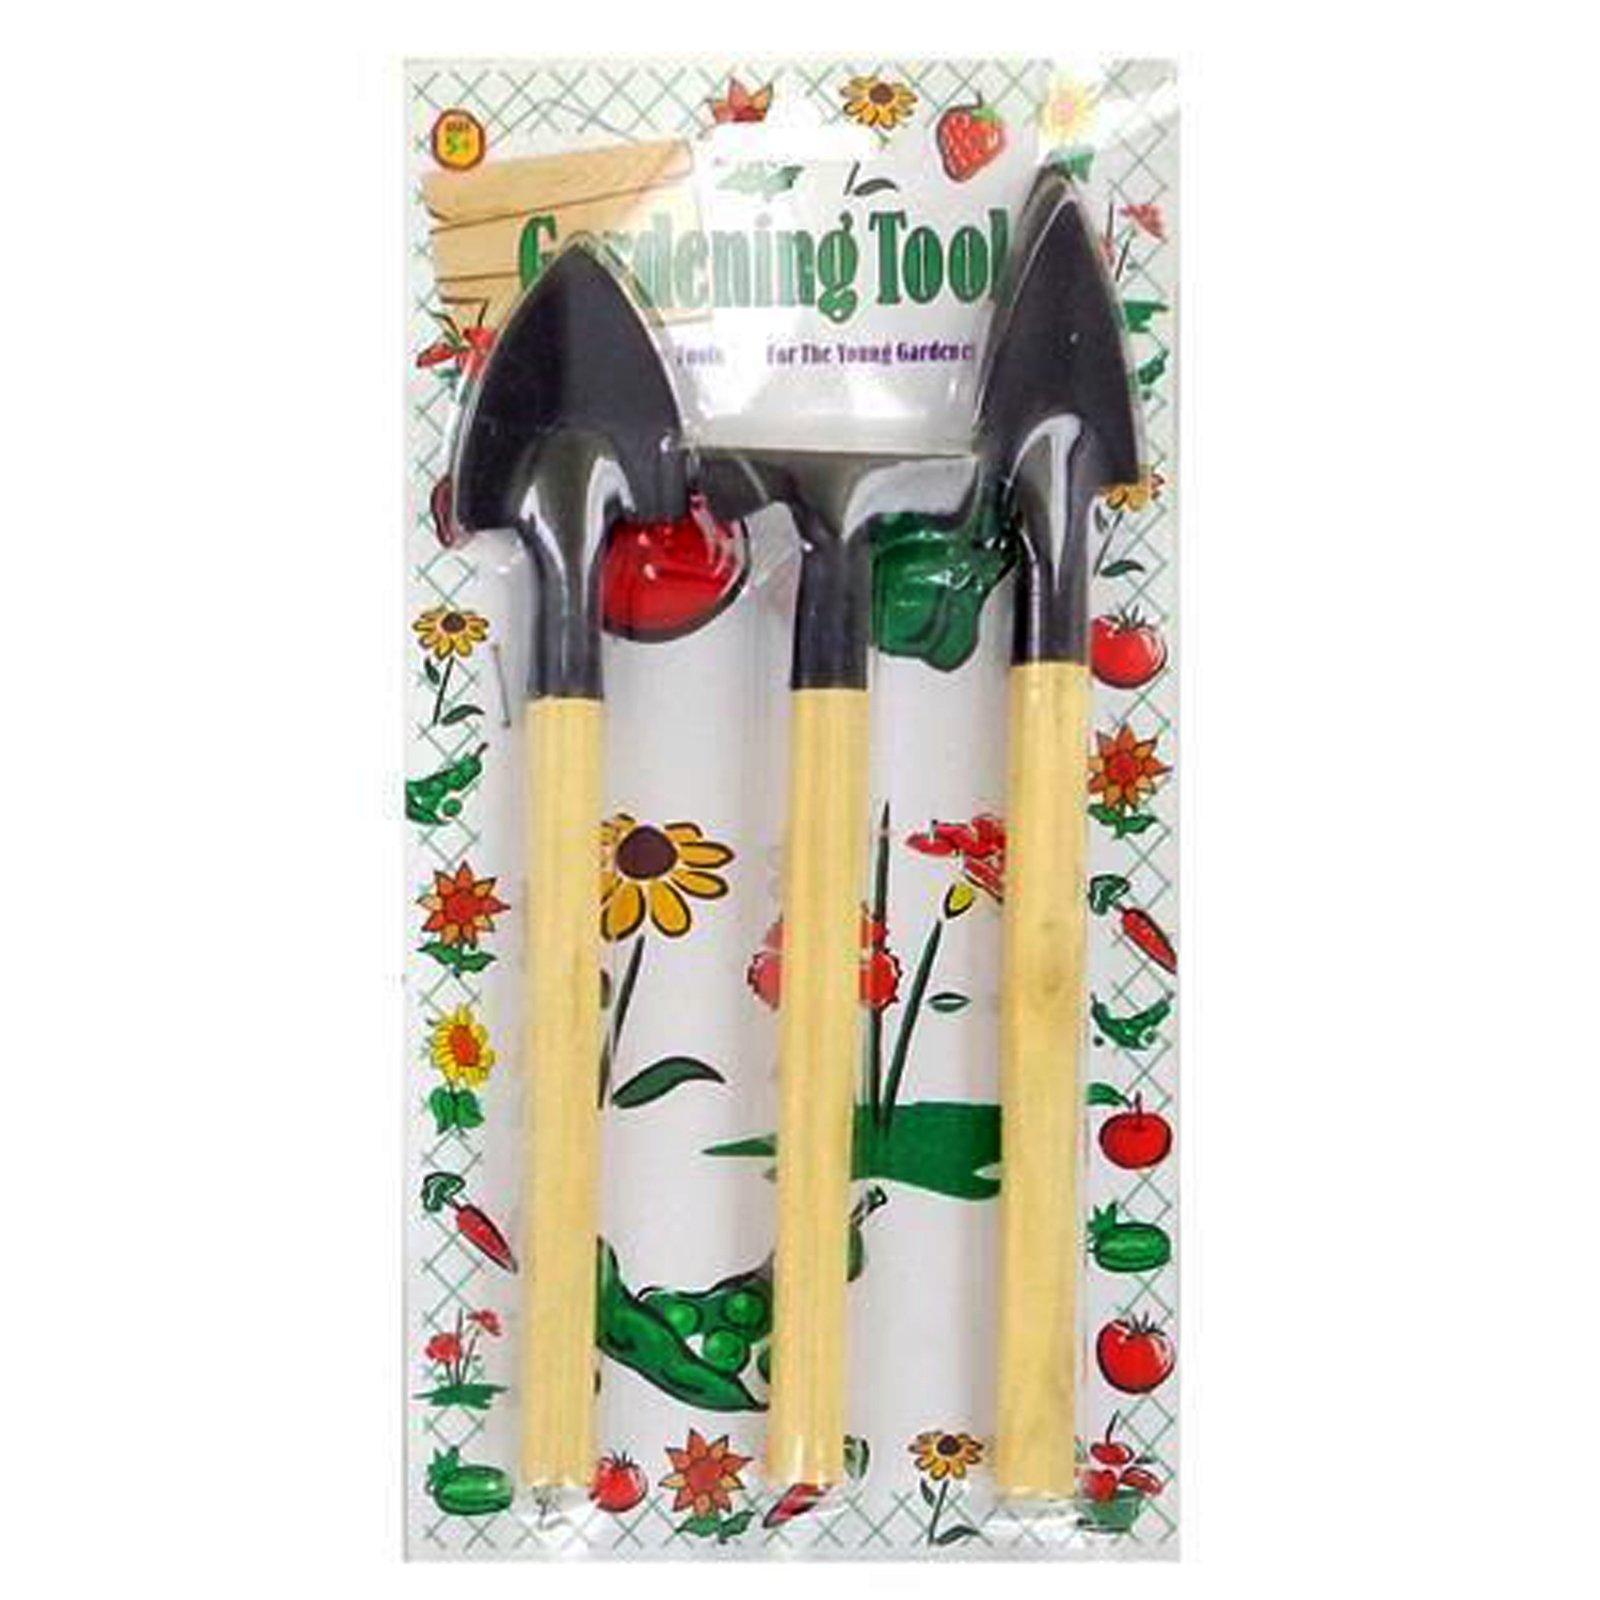 3 Piece Mini Wooden Handheld Gardening Tool Set